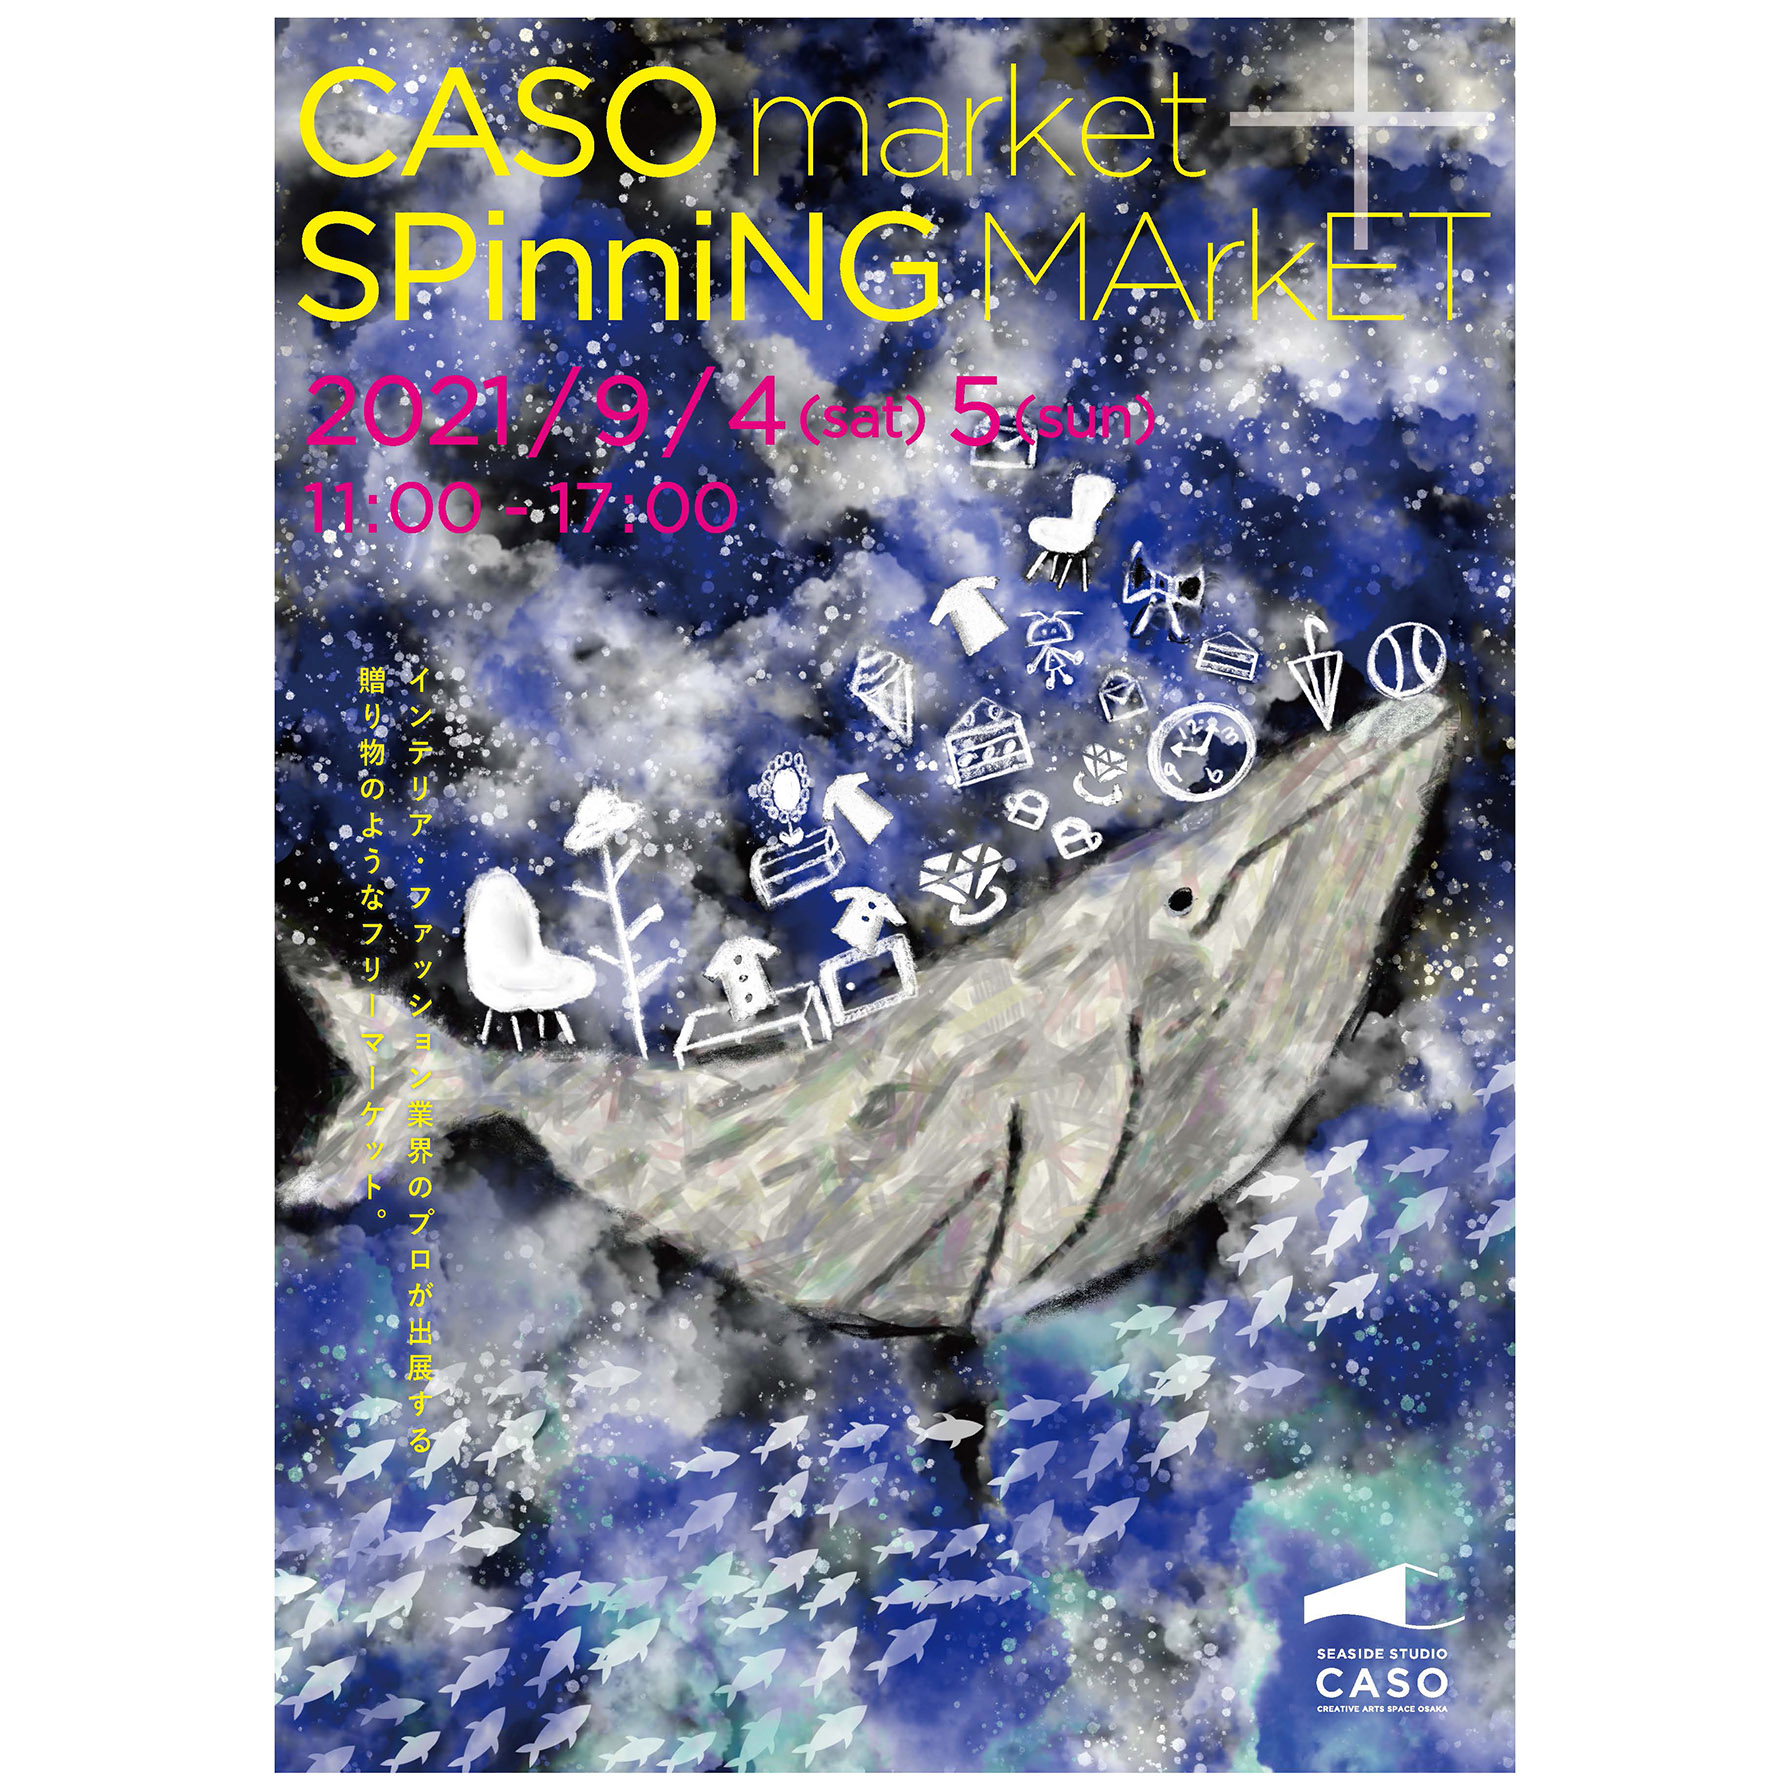 CASOmarket+SPinniNGMArkET